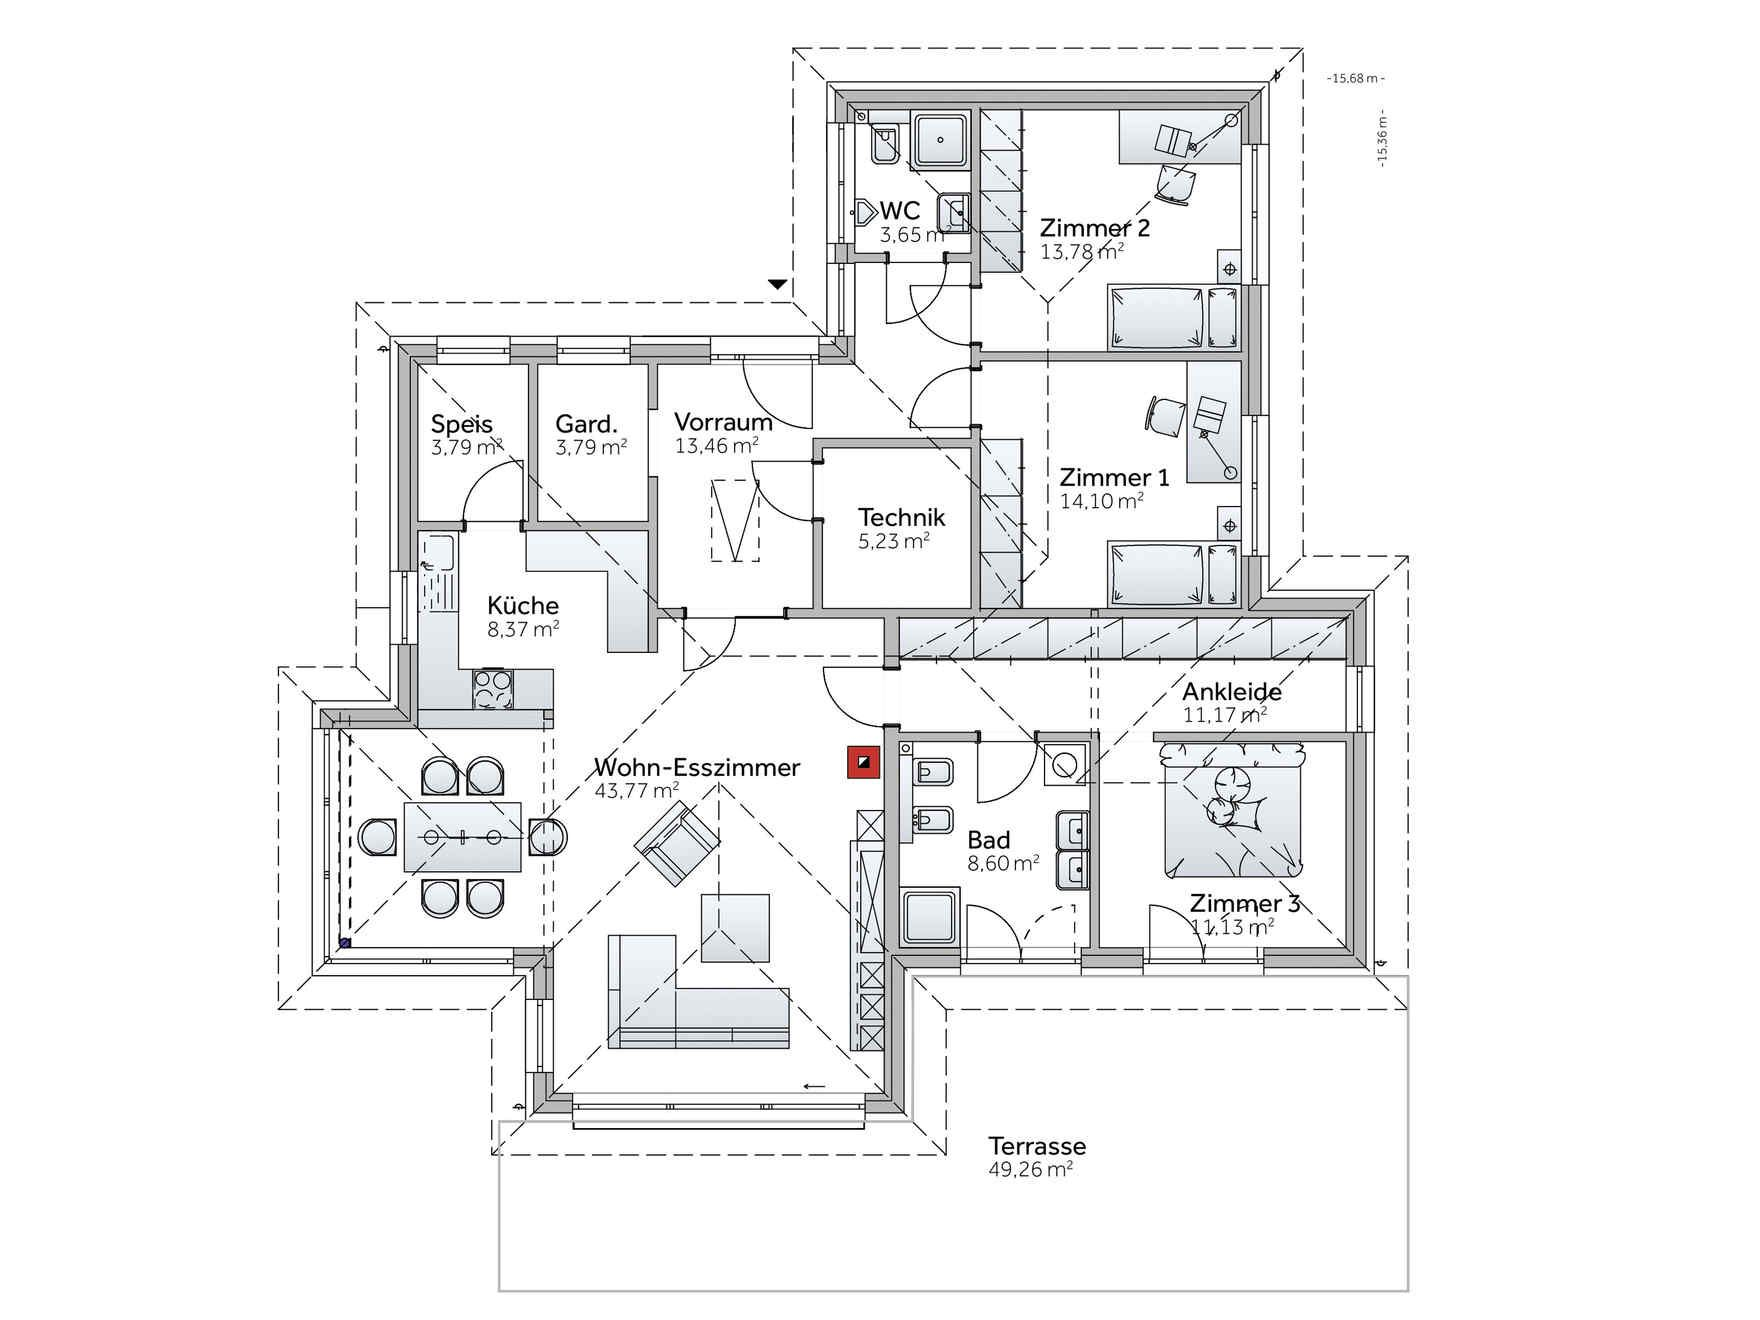 Fertighaus bungalow grundriss  Fertighaus Bungalow S141 | Architektur | Pinterest | Fertighaus ...